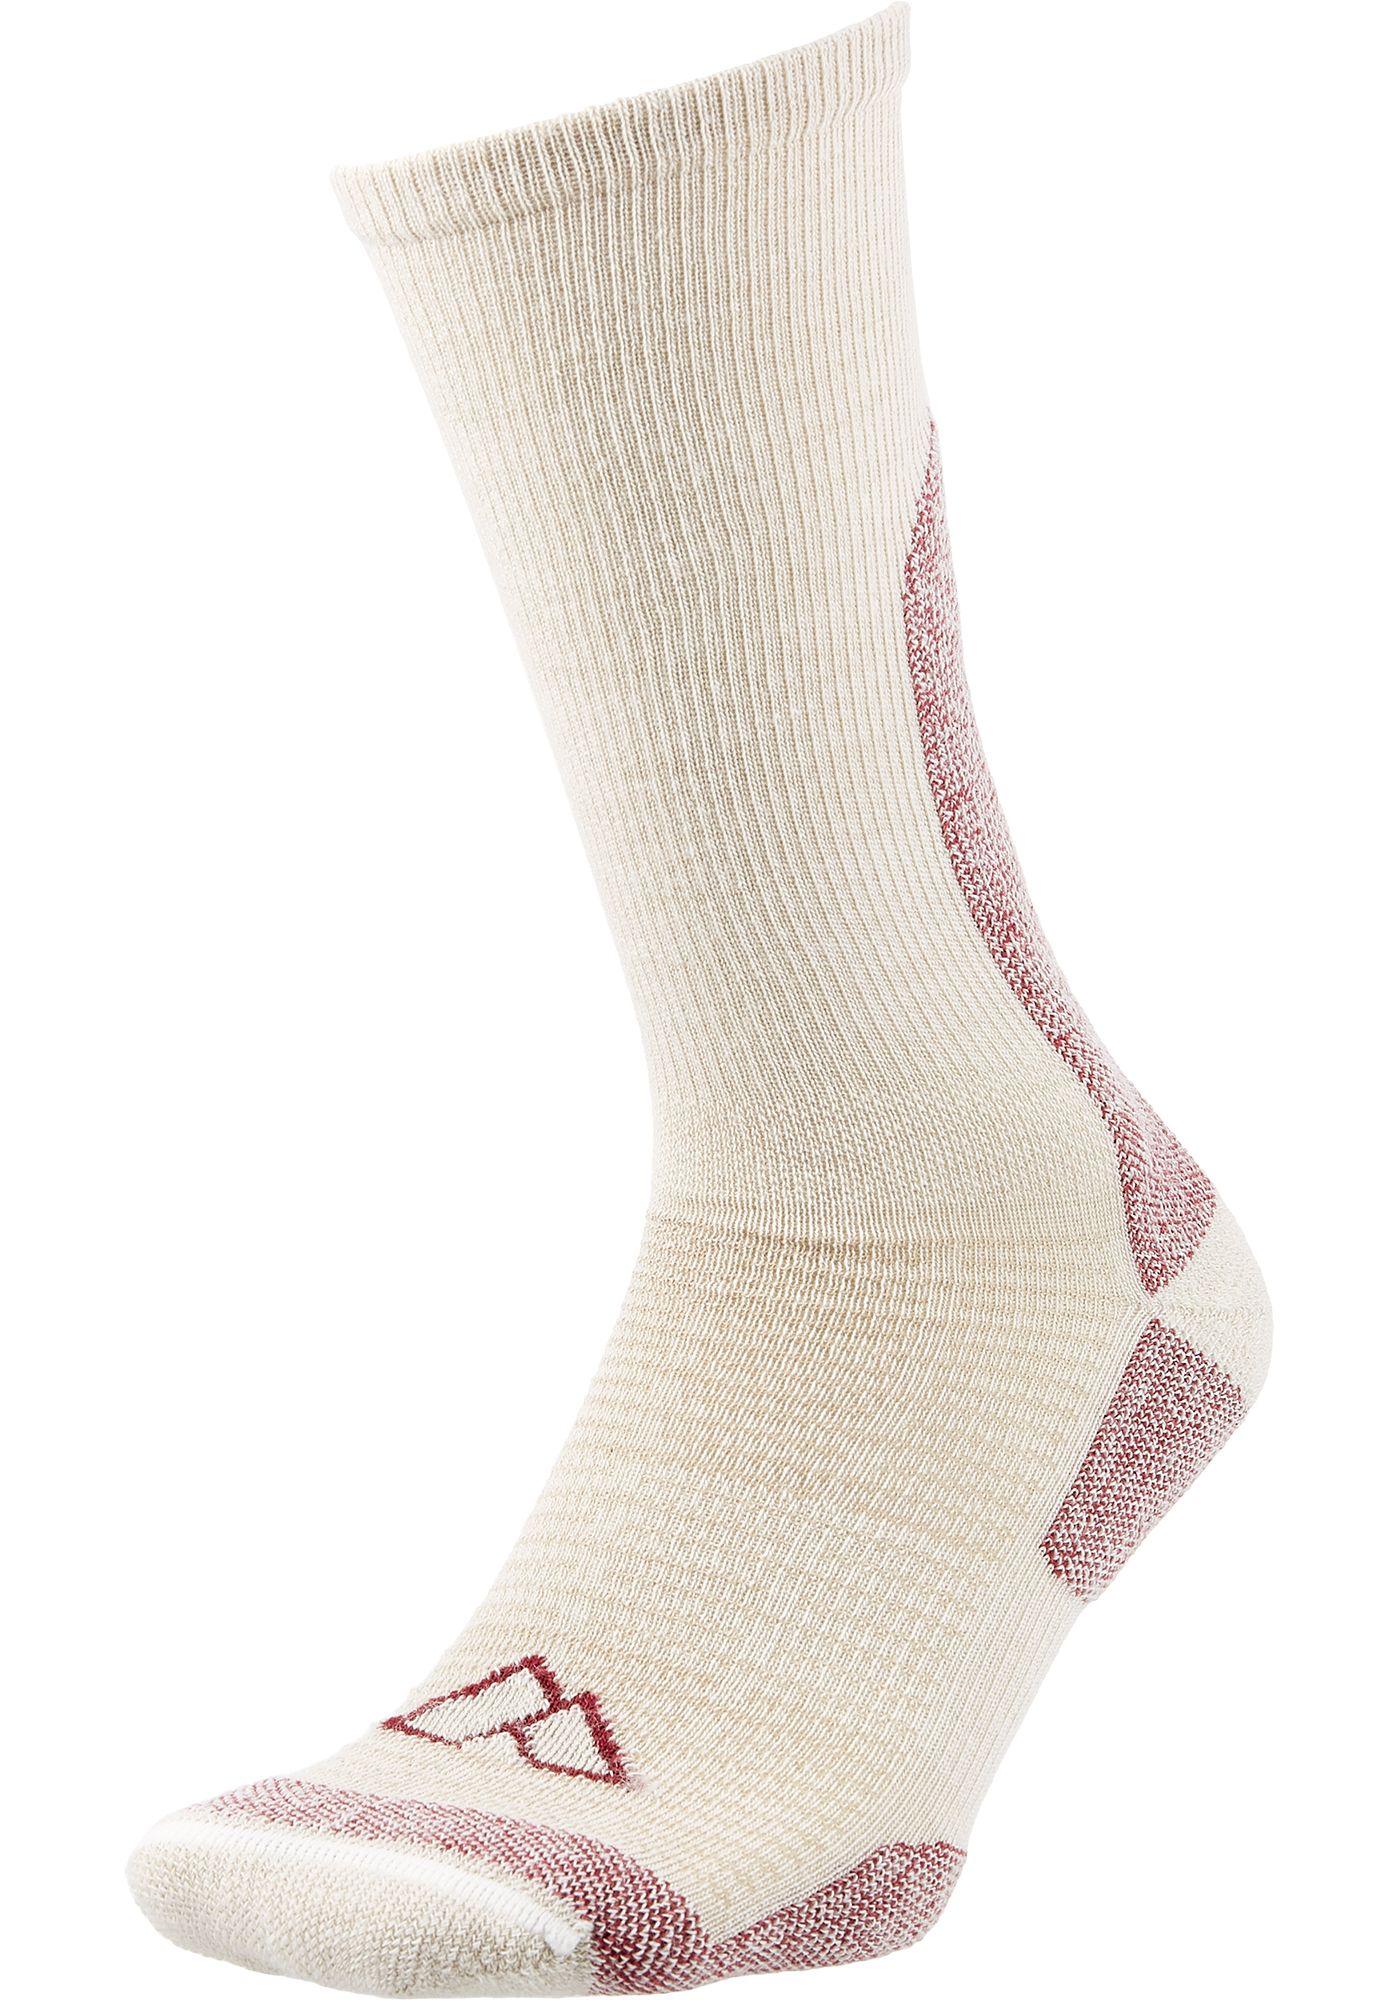 Alpine Design Women's Crew Hiking Socks